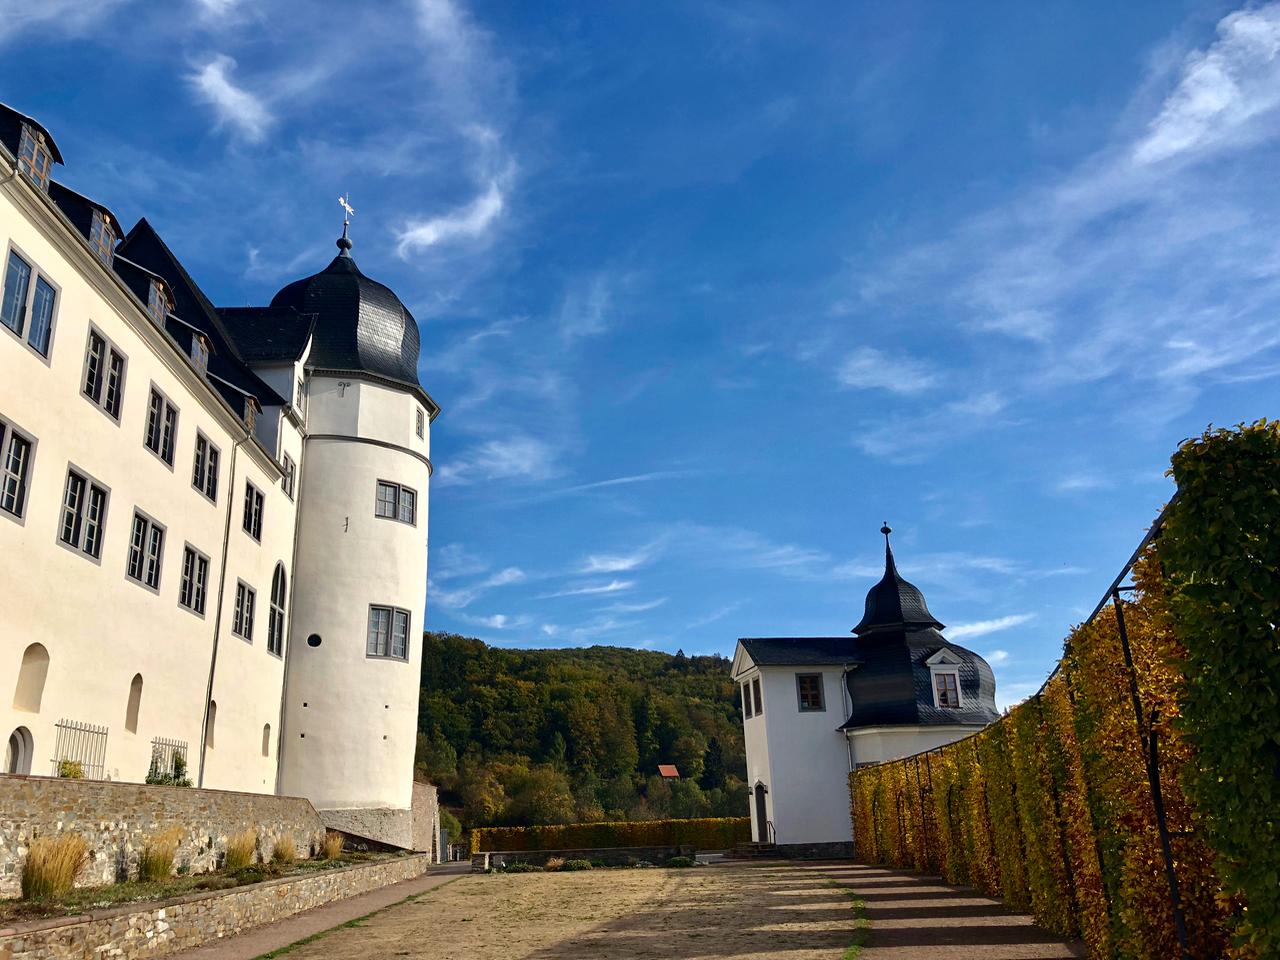 Historische Stadt Harz Stolberg